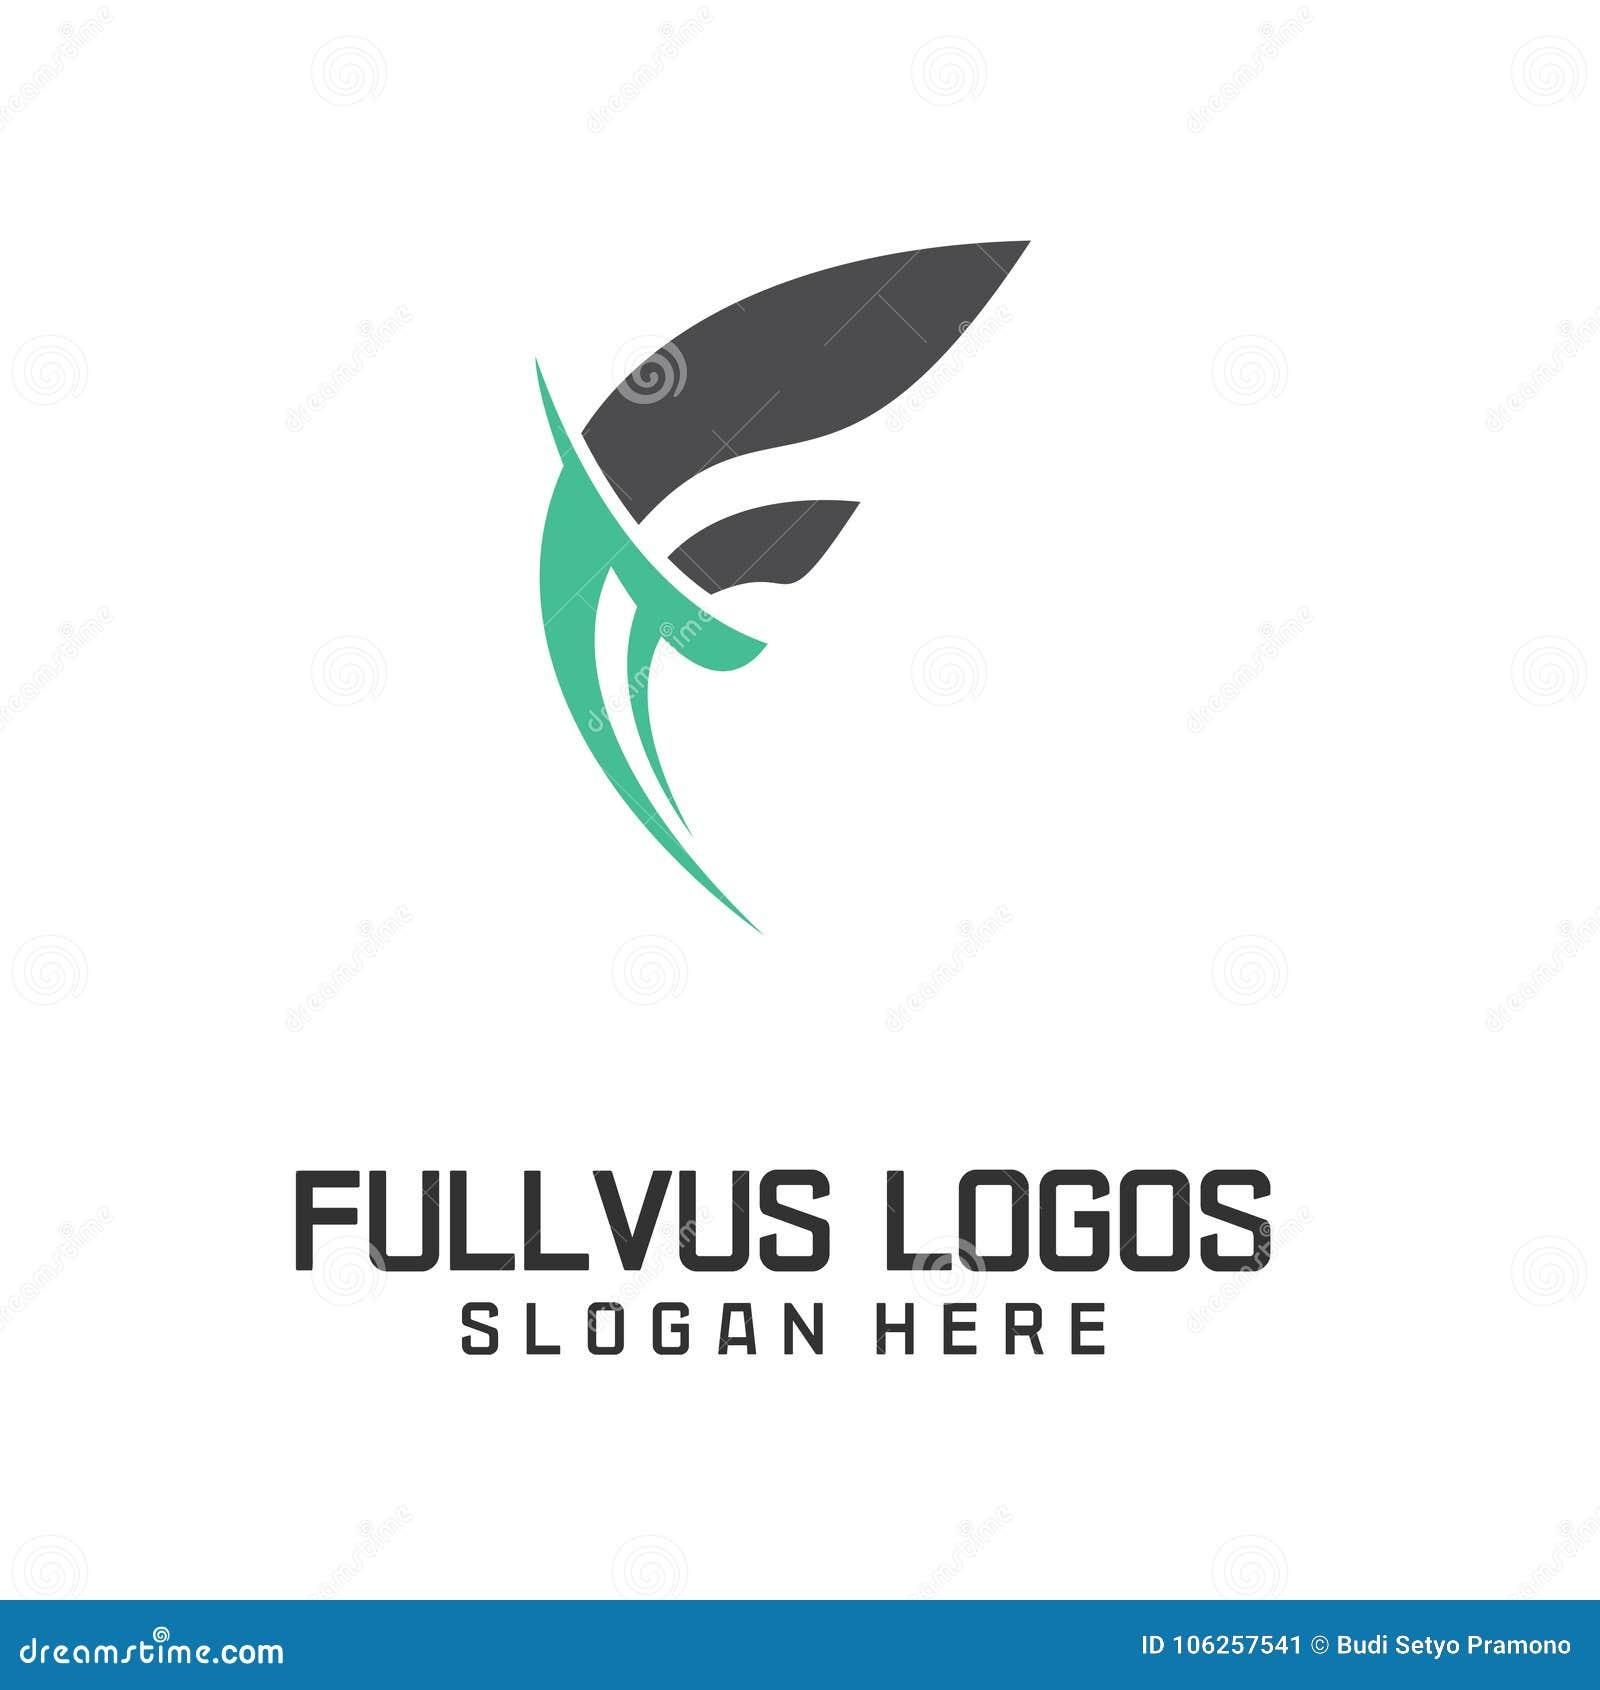 Letter f logo icon design template elements stock illustration download letter f logo icon design template elements stock illustration illustration of geometric brand maxwellsz